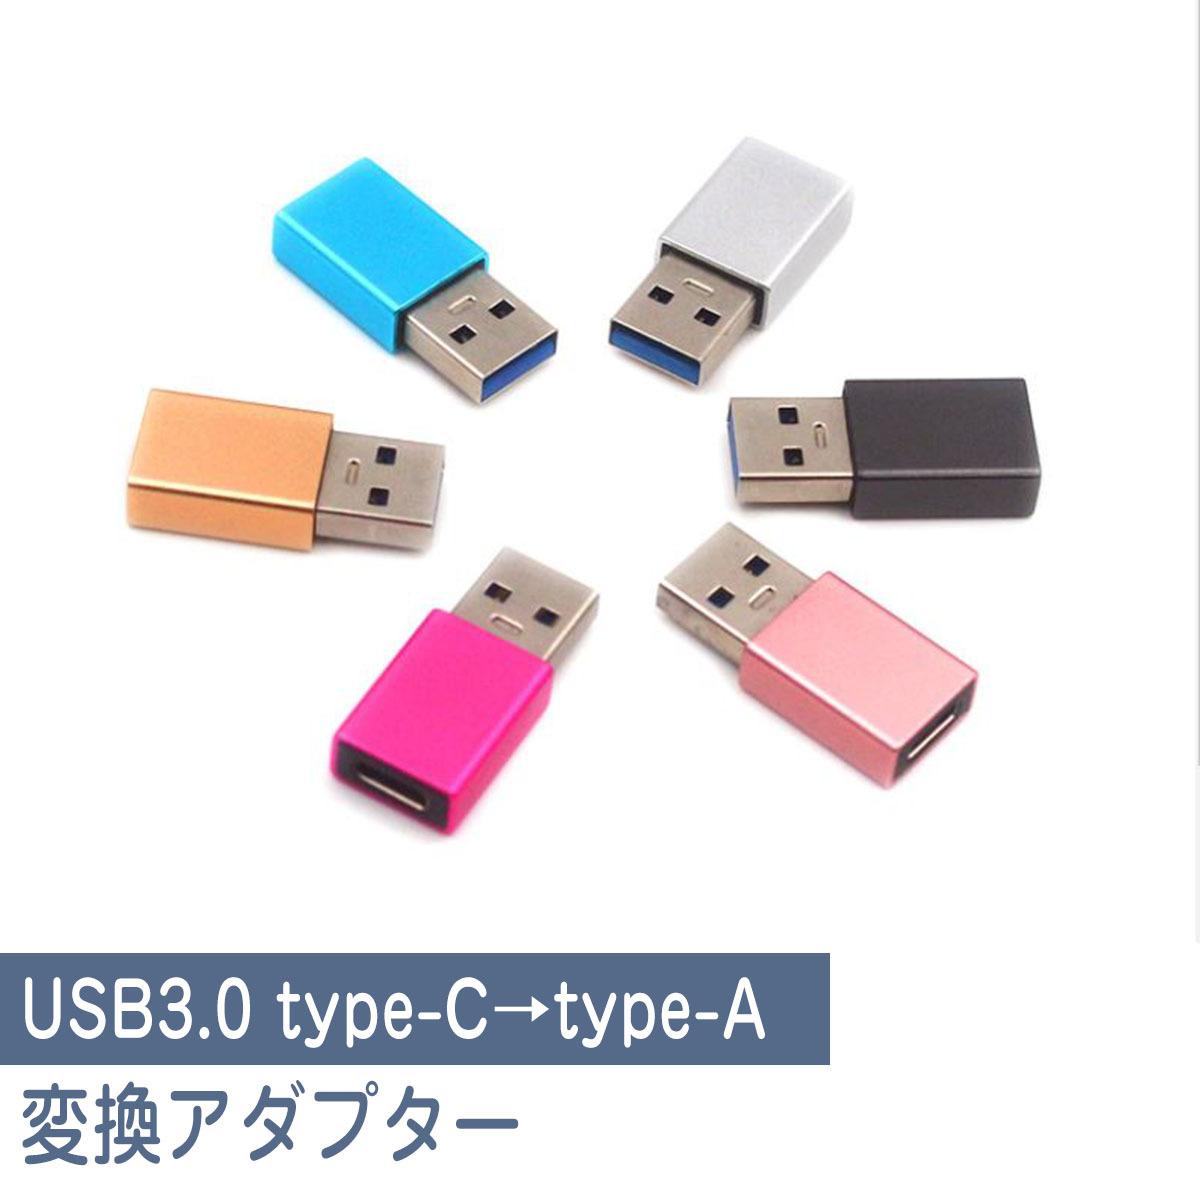 USB3.0 type C 変換 アダプタ 【送料無料】タイプc 変換アダプター Type-C to TypeA 変換アダプタ usb 変換 ケーブル イヤホン データ転送 充電 USB充電 便利 コンパクト 在宅 テレワーク